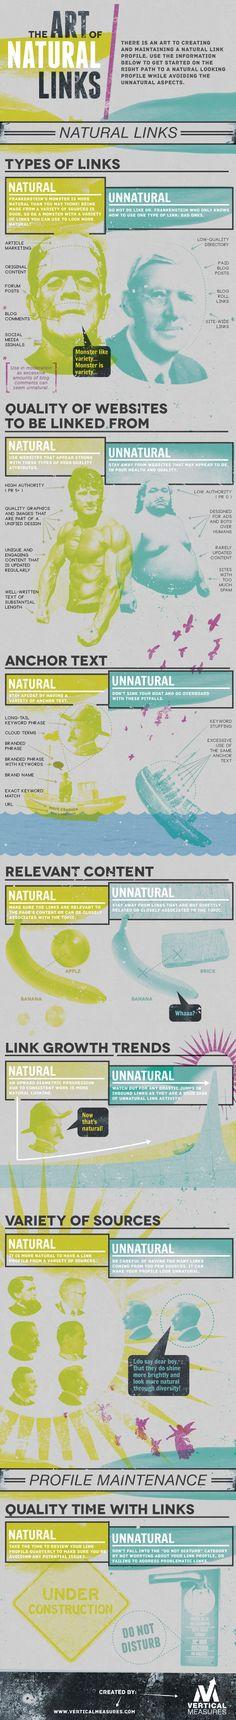 Natural Linkbuilding The Art of Natural Linkbuilding